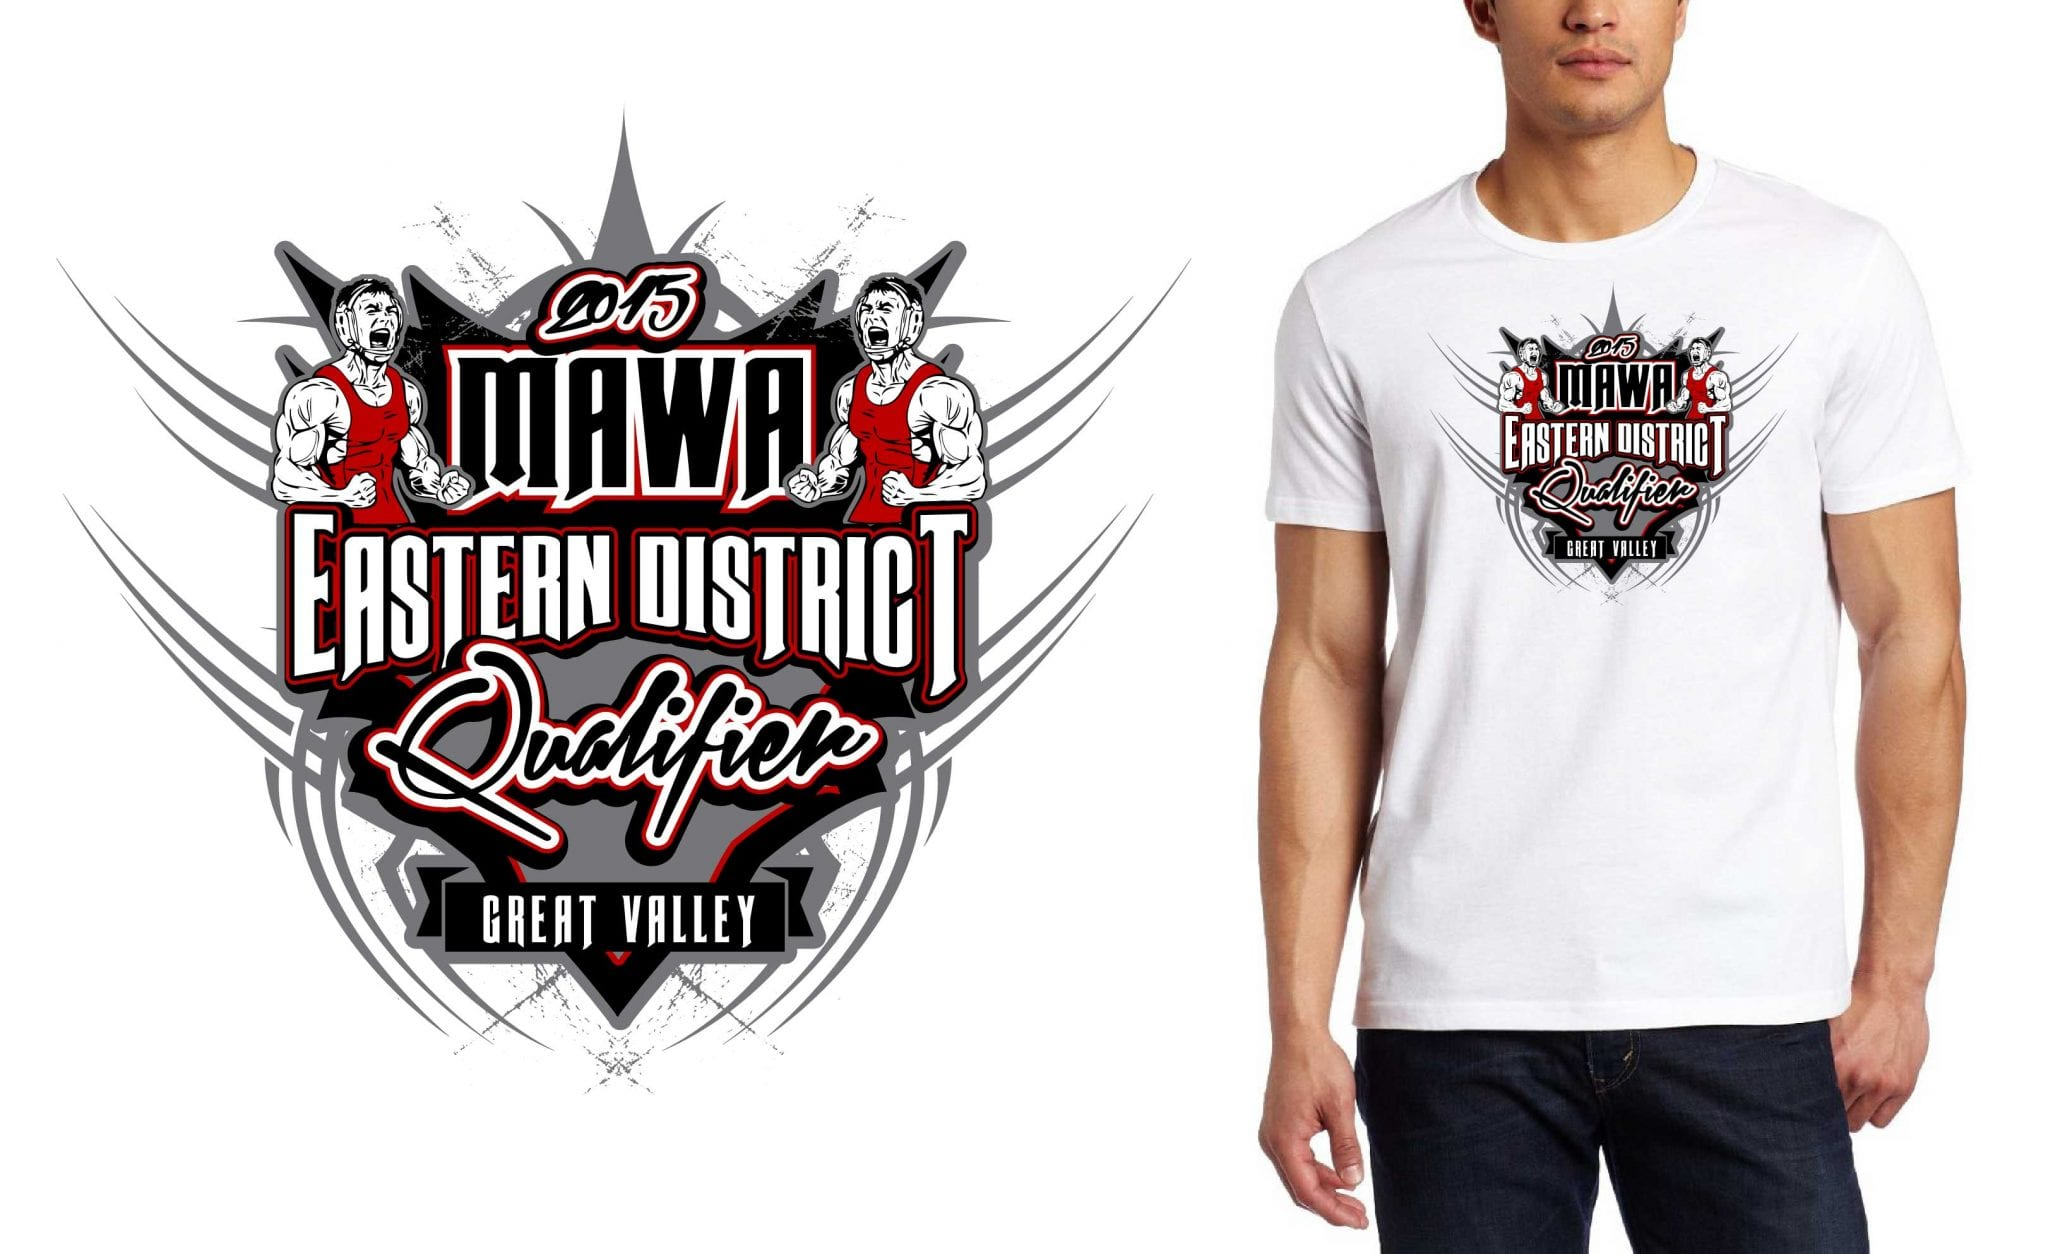 2015 MAWA Eastern District Qualifier cool wrestling tshirt design